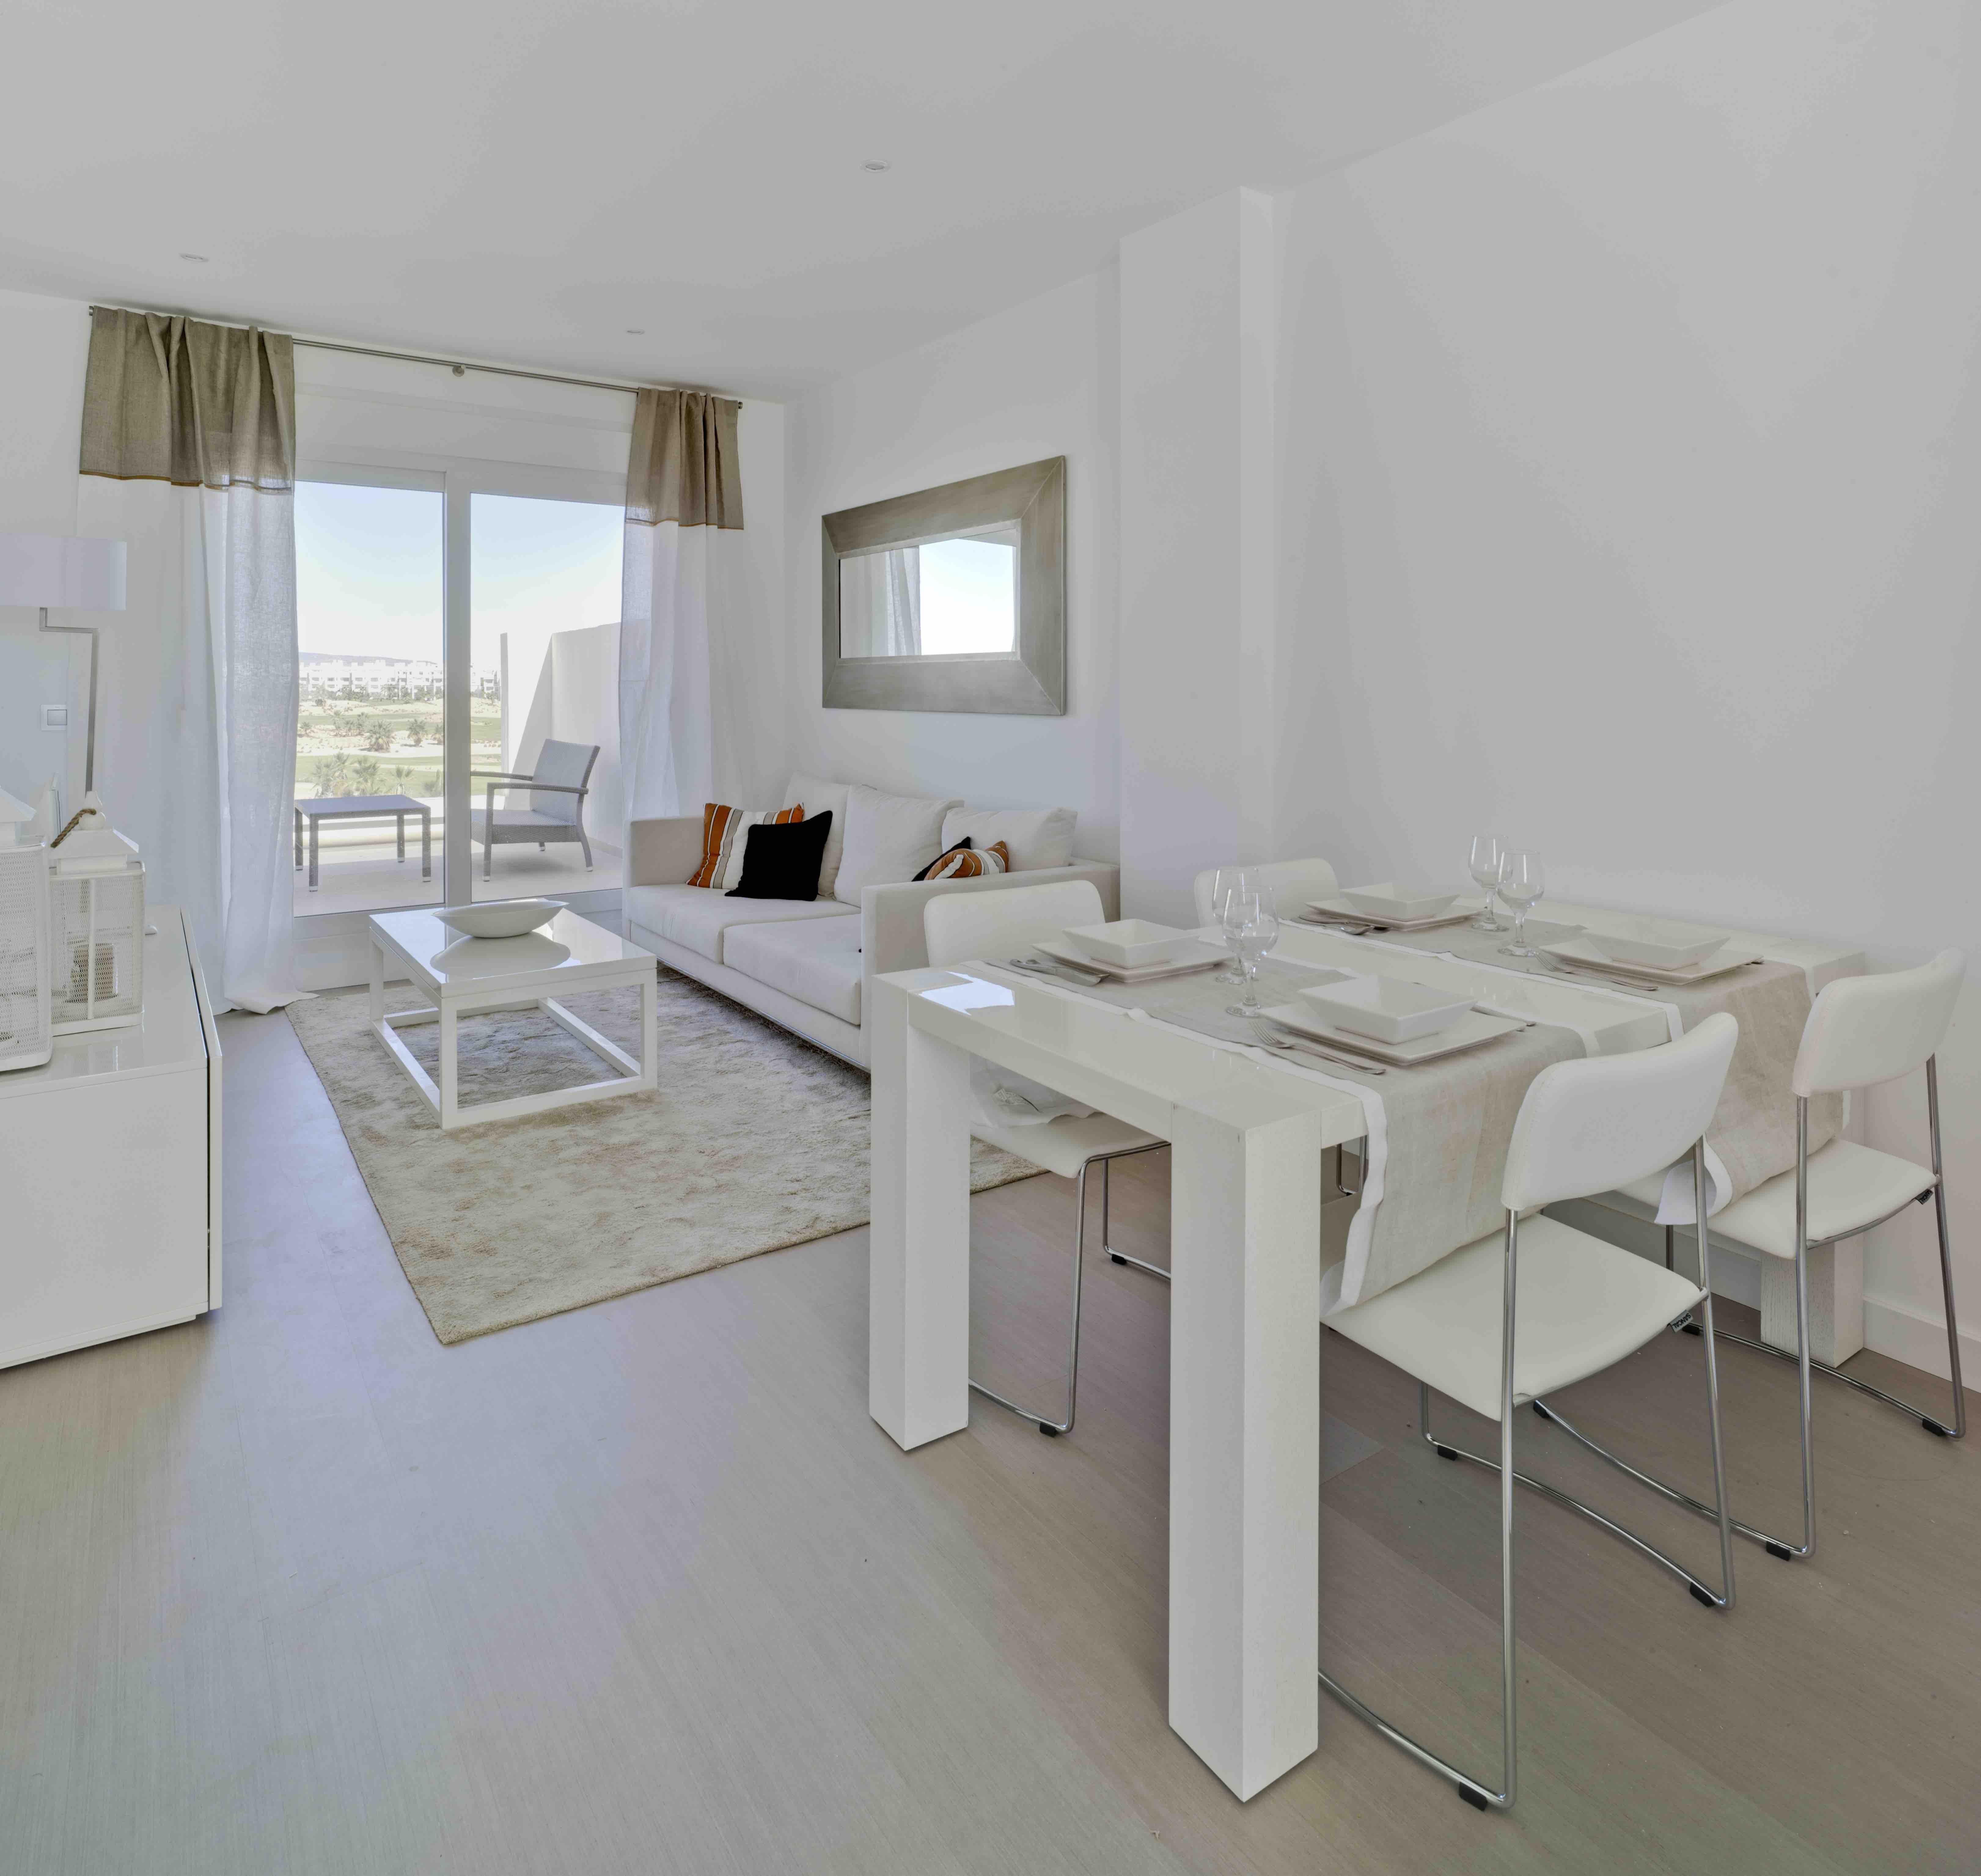 2 bedroom apartment For Sale in Roldan - photograph 12